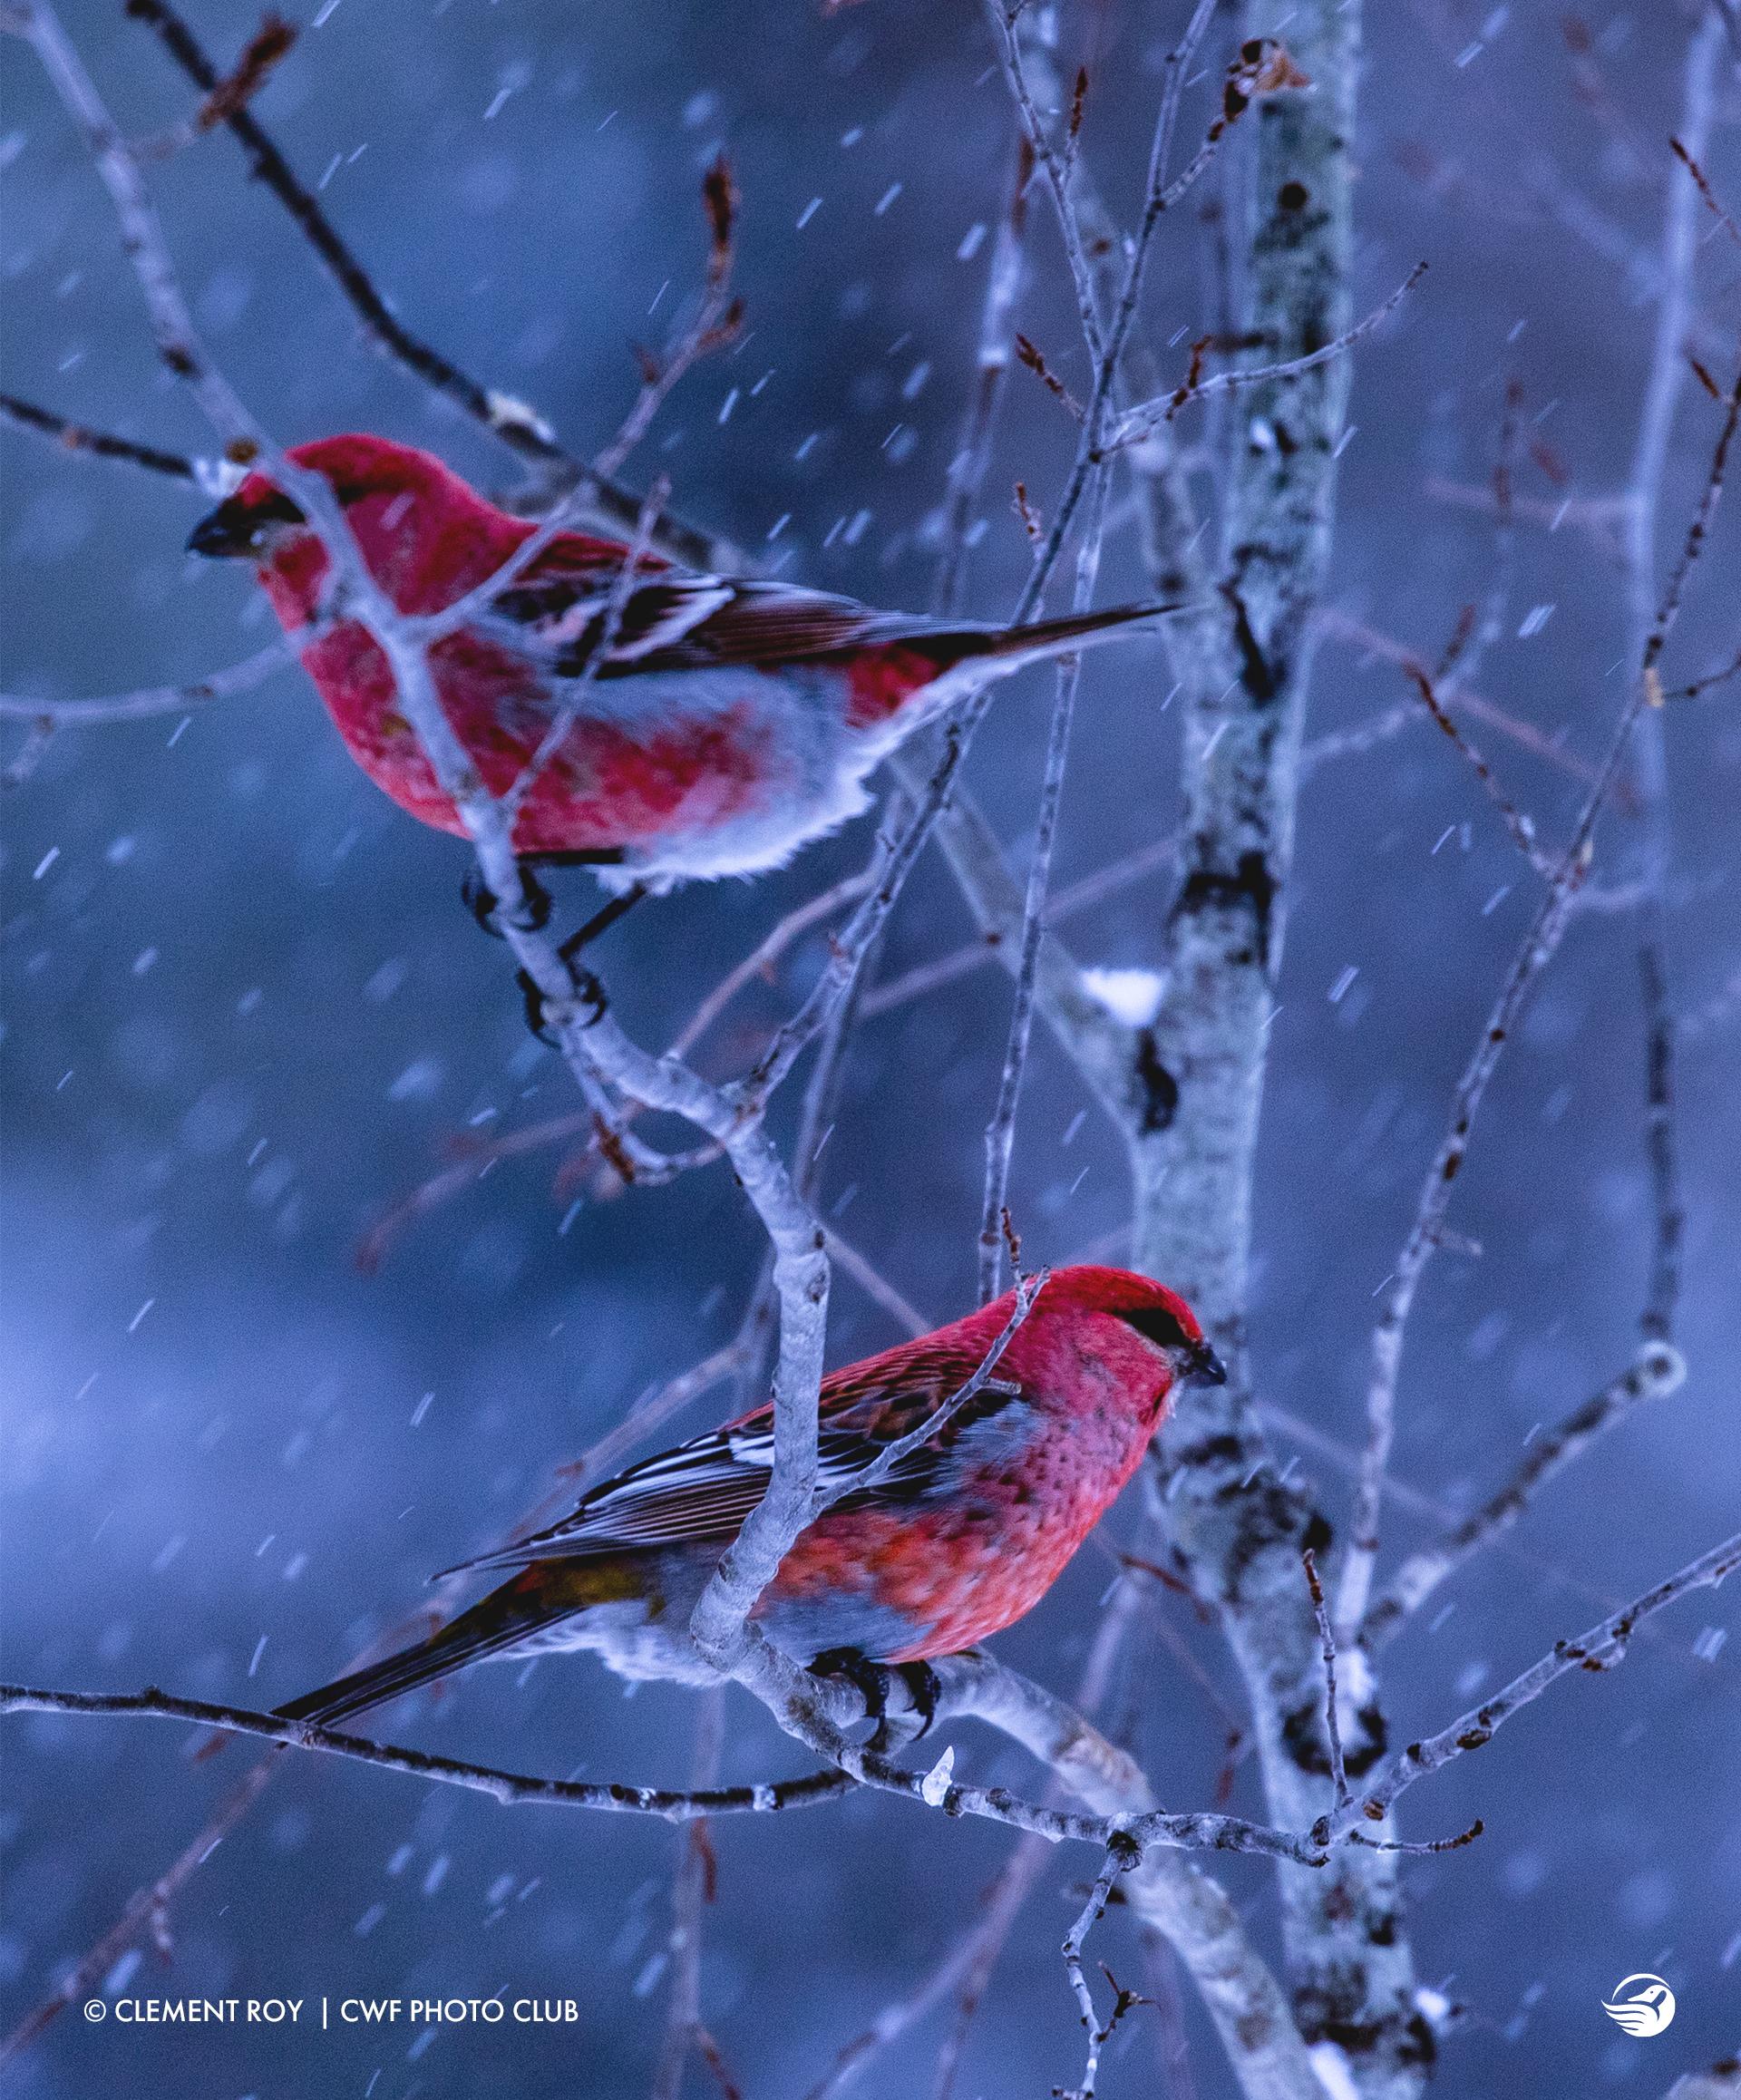 clement-roy-birds-winter-snow